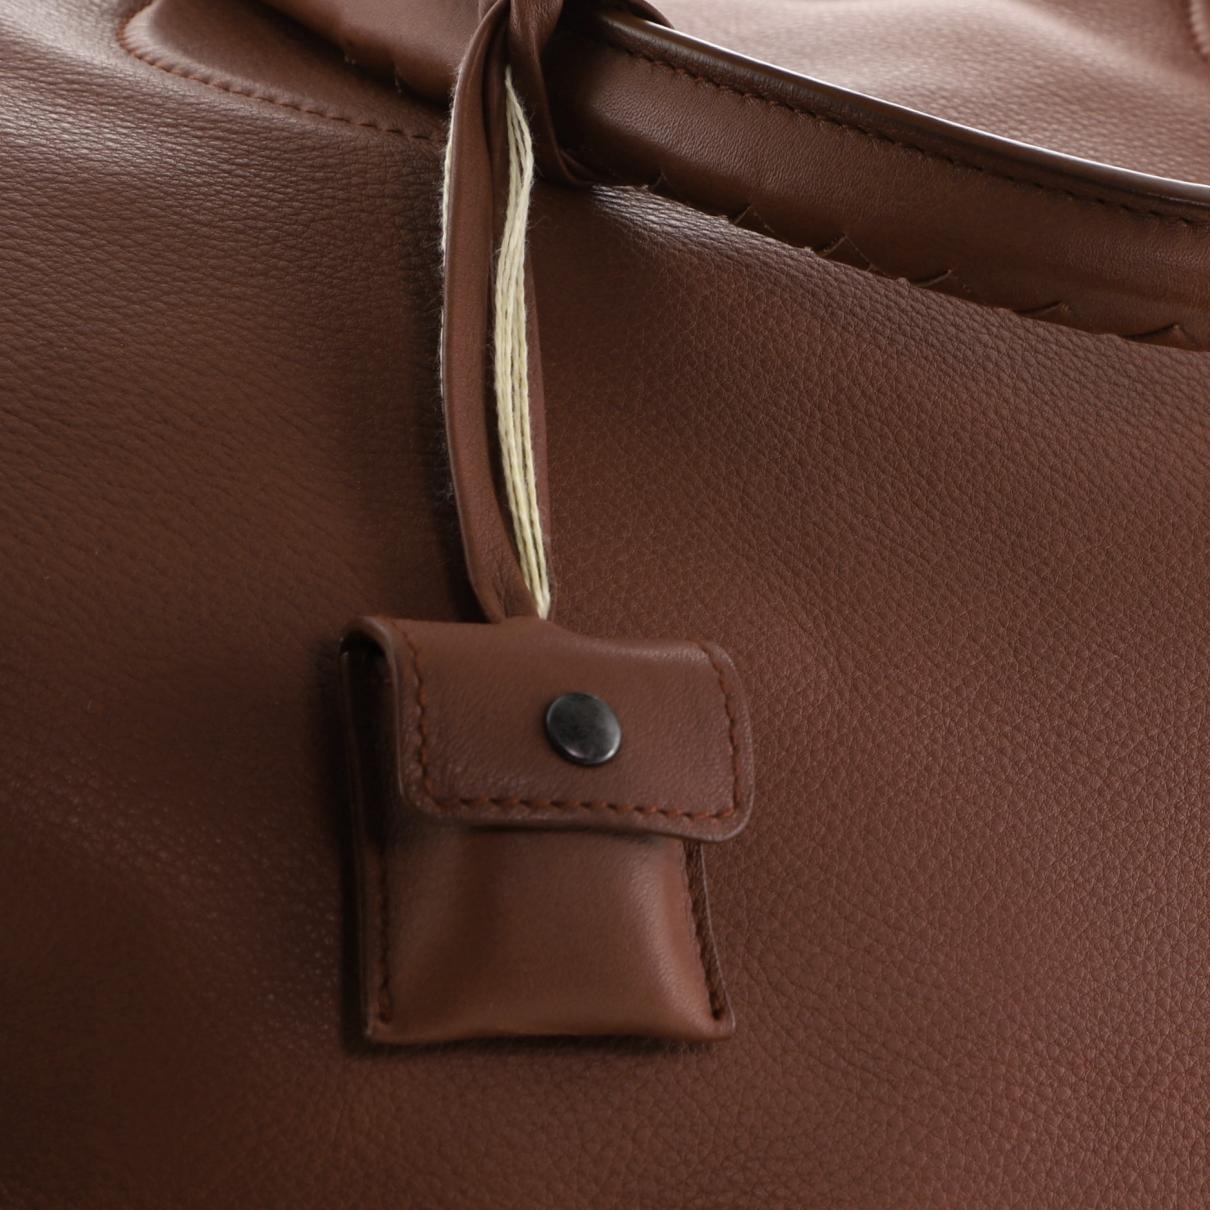 Bottega Veneta - Sac a main   pour femme en cuir - marron